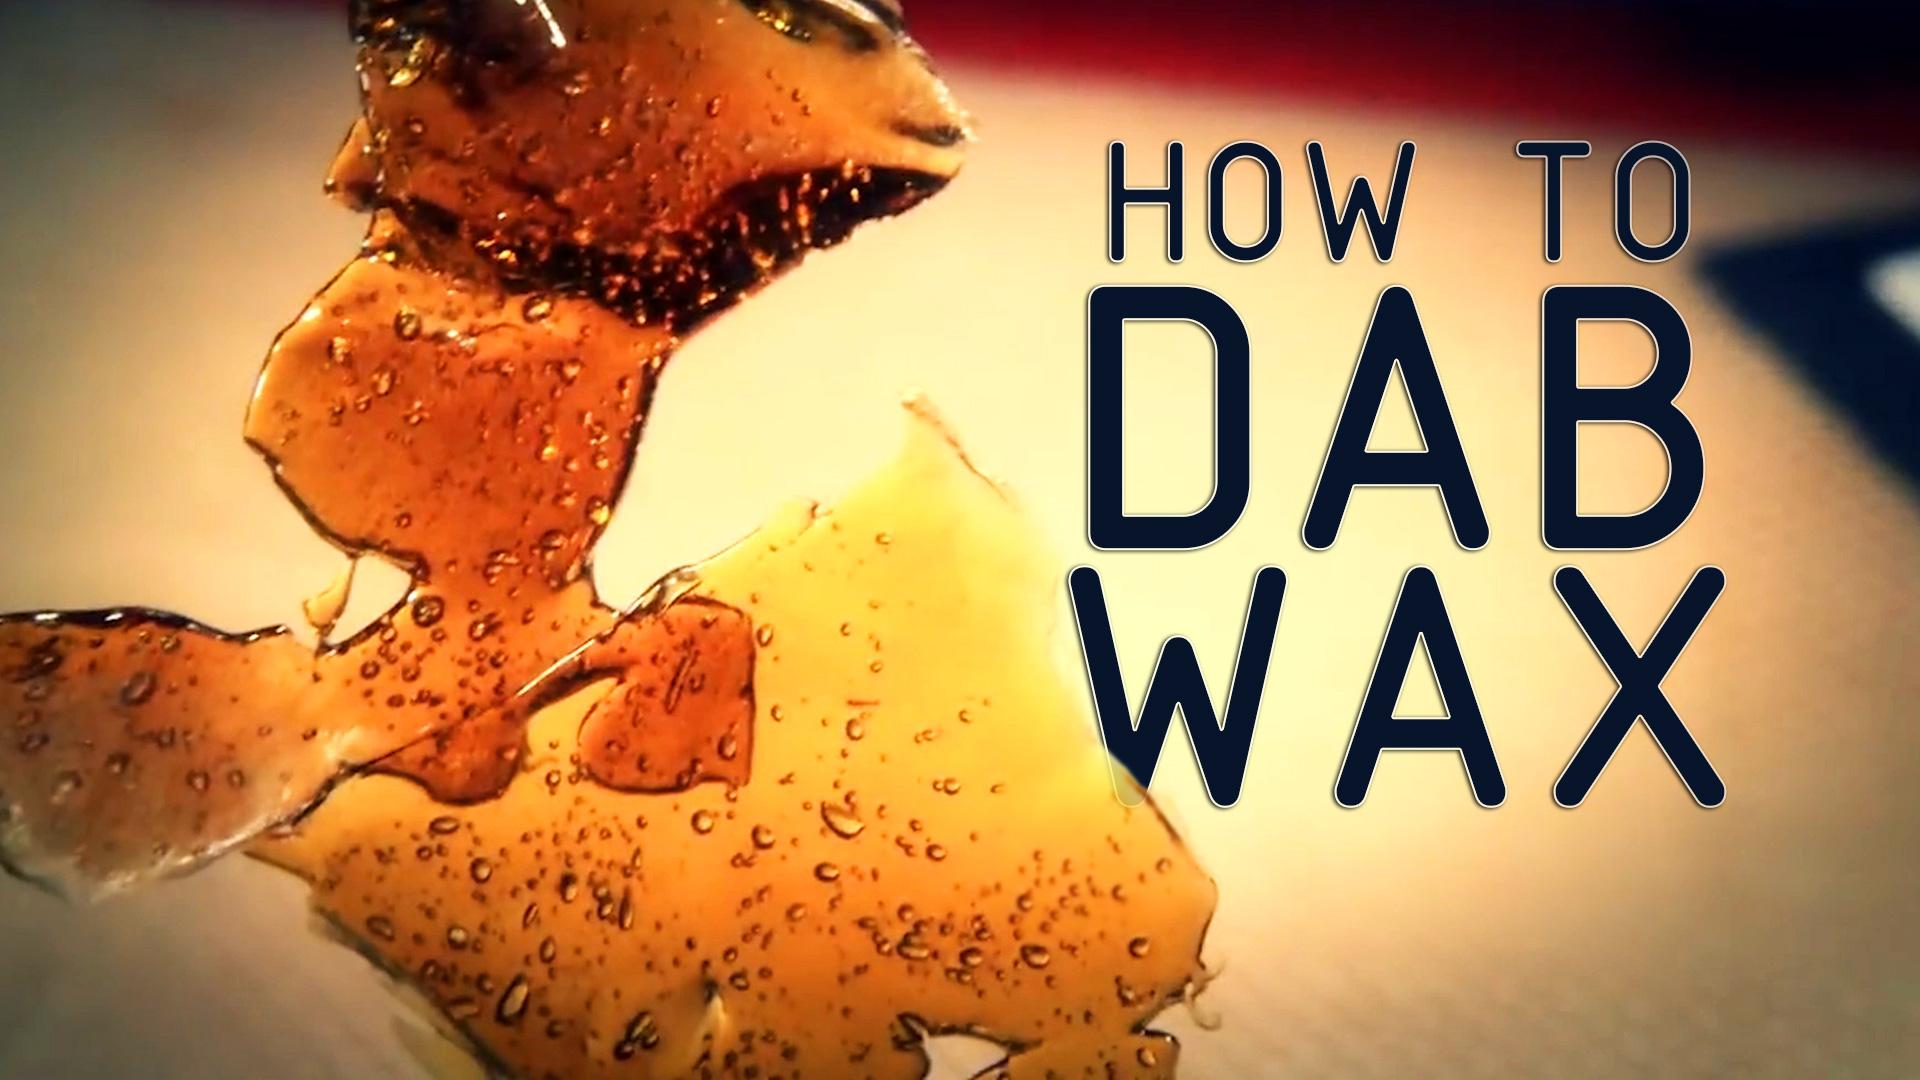 how-to-dab-wax-part-2-cannabasics-107-still-1